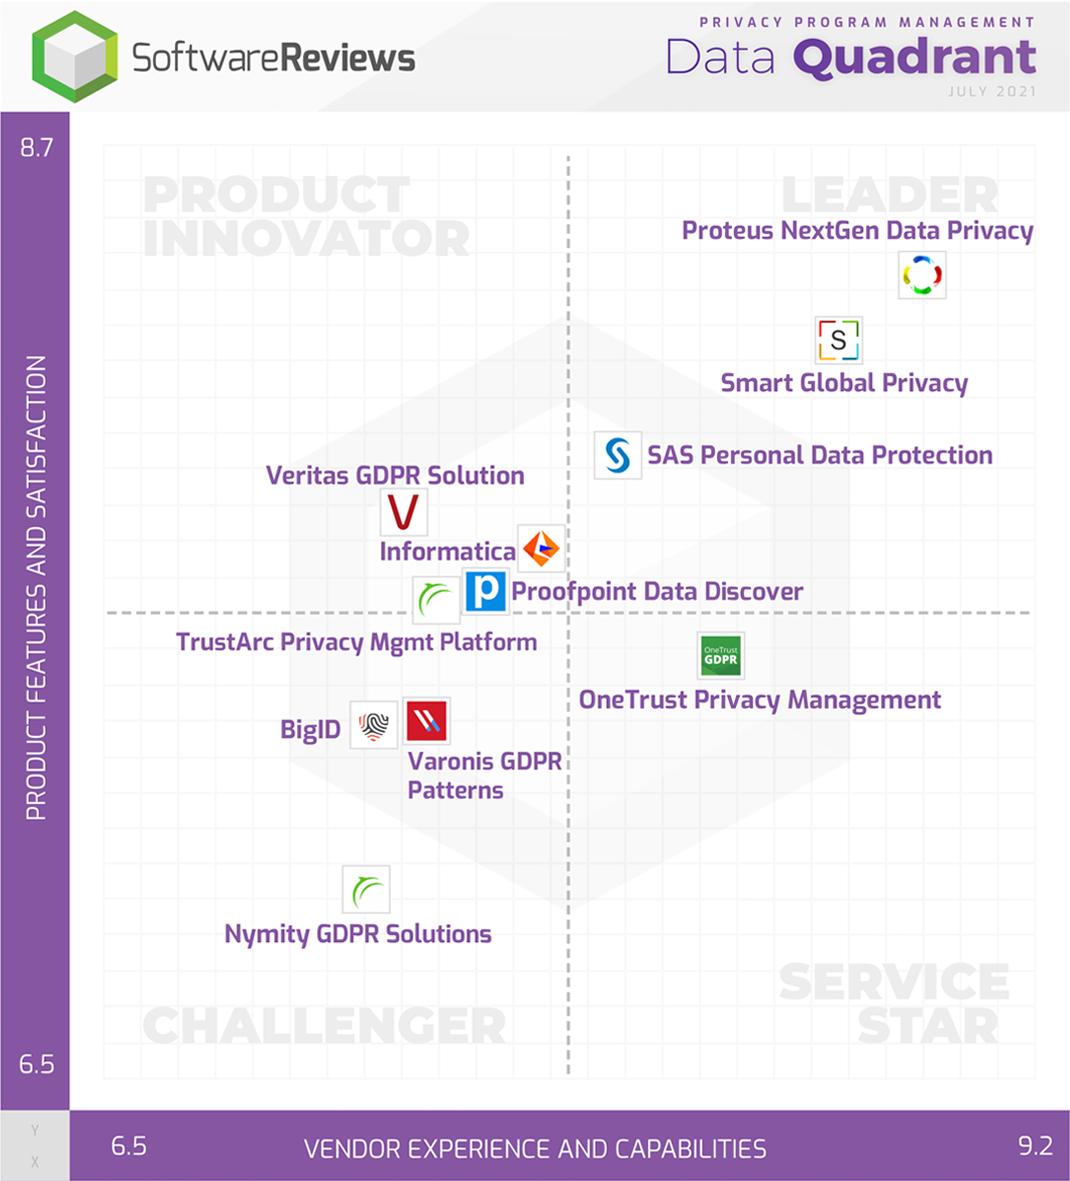 Privacy Program Management Data Quadrant